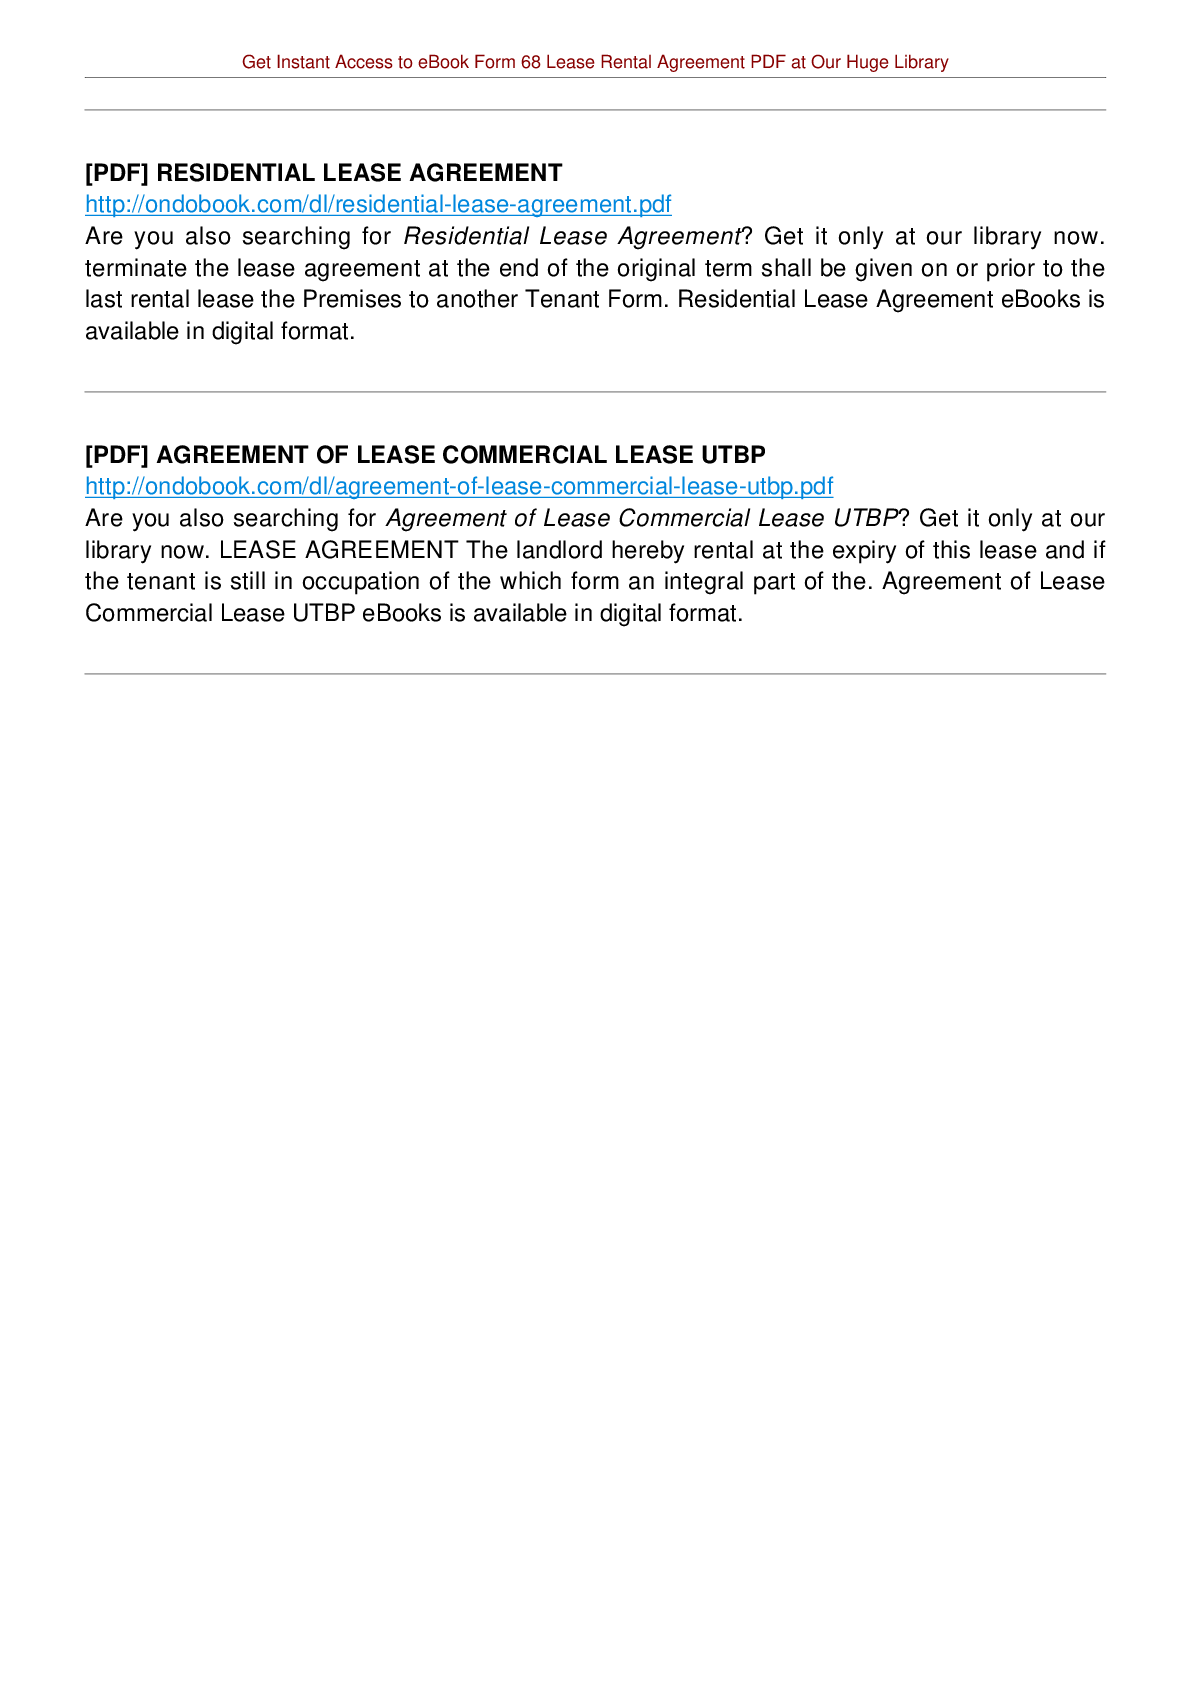 Form 68 Lease Rental Agreement Pdf